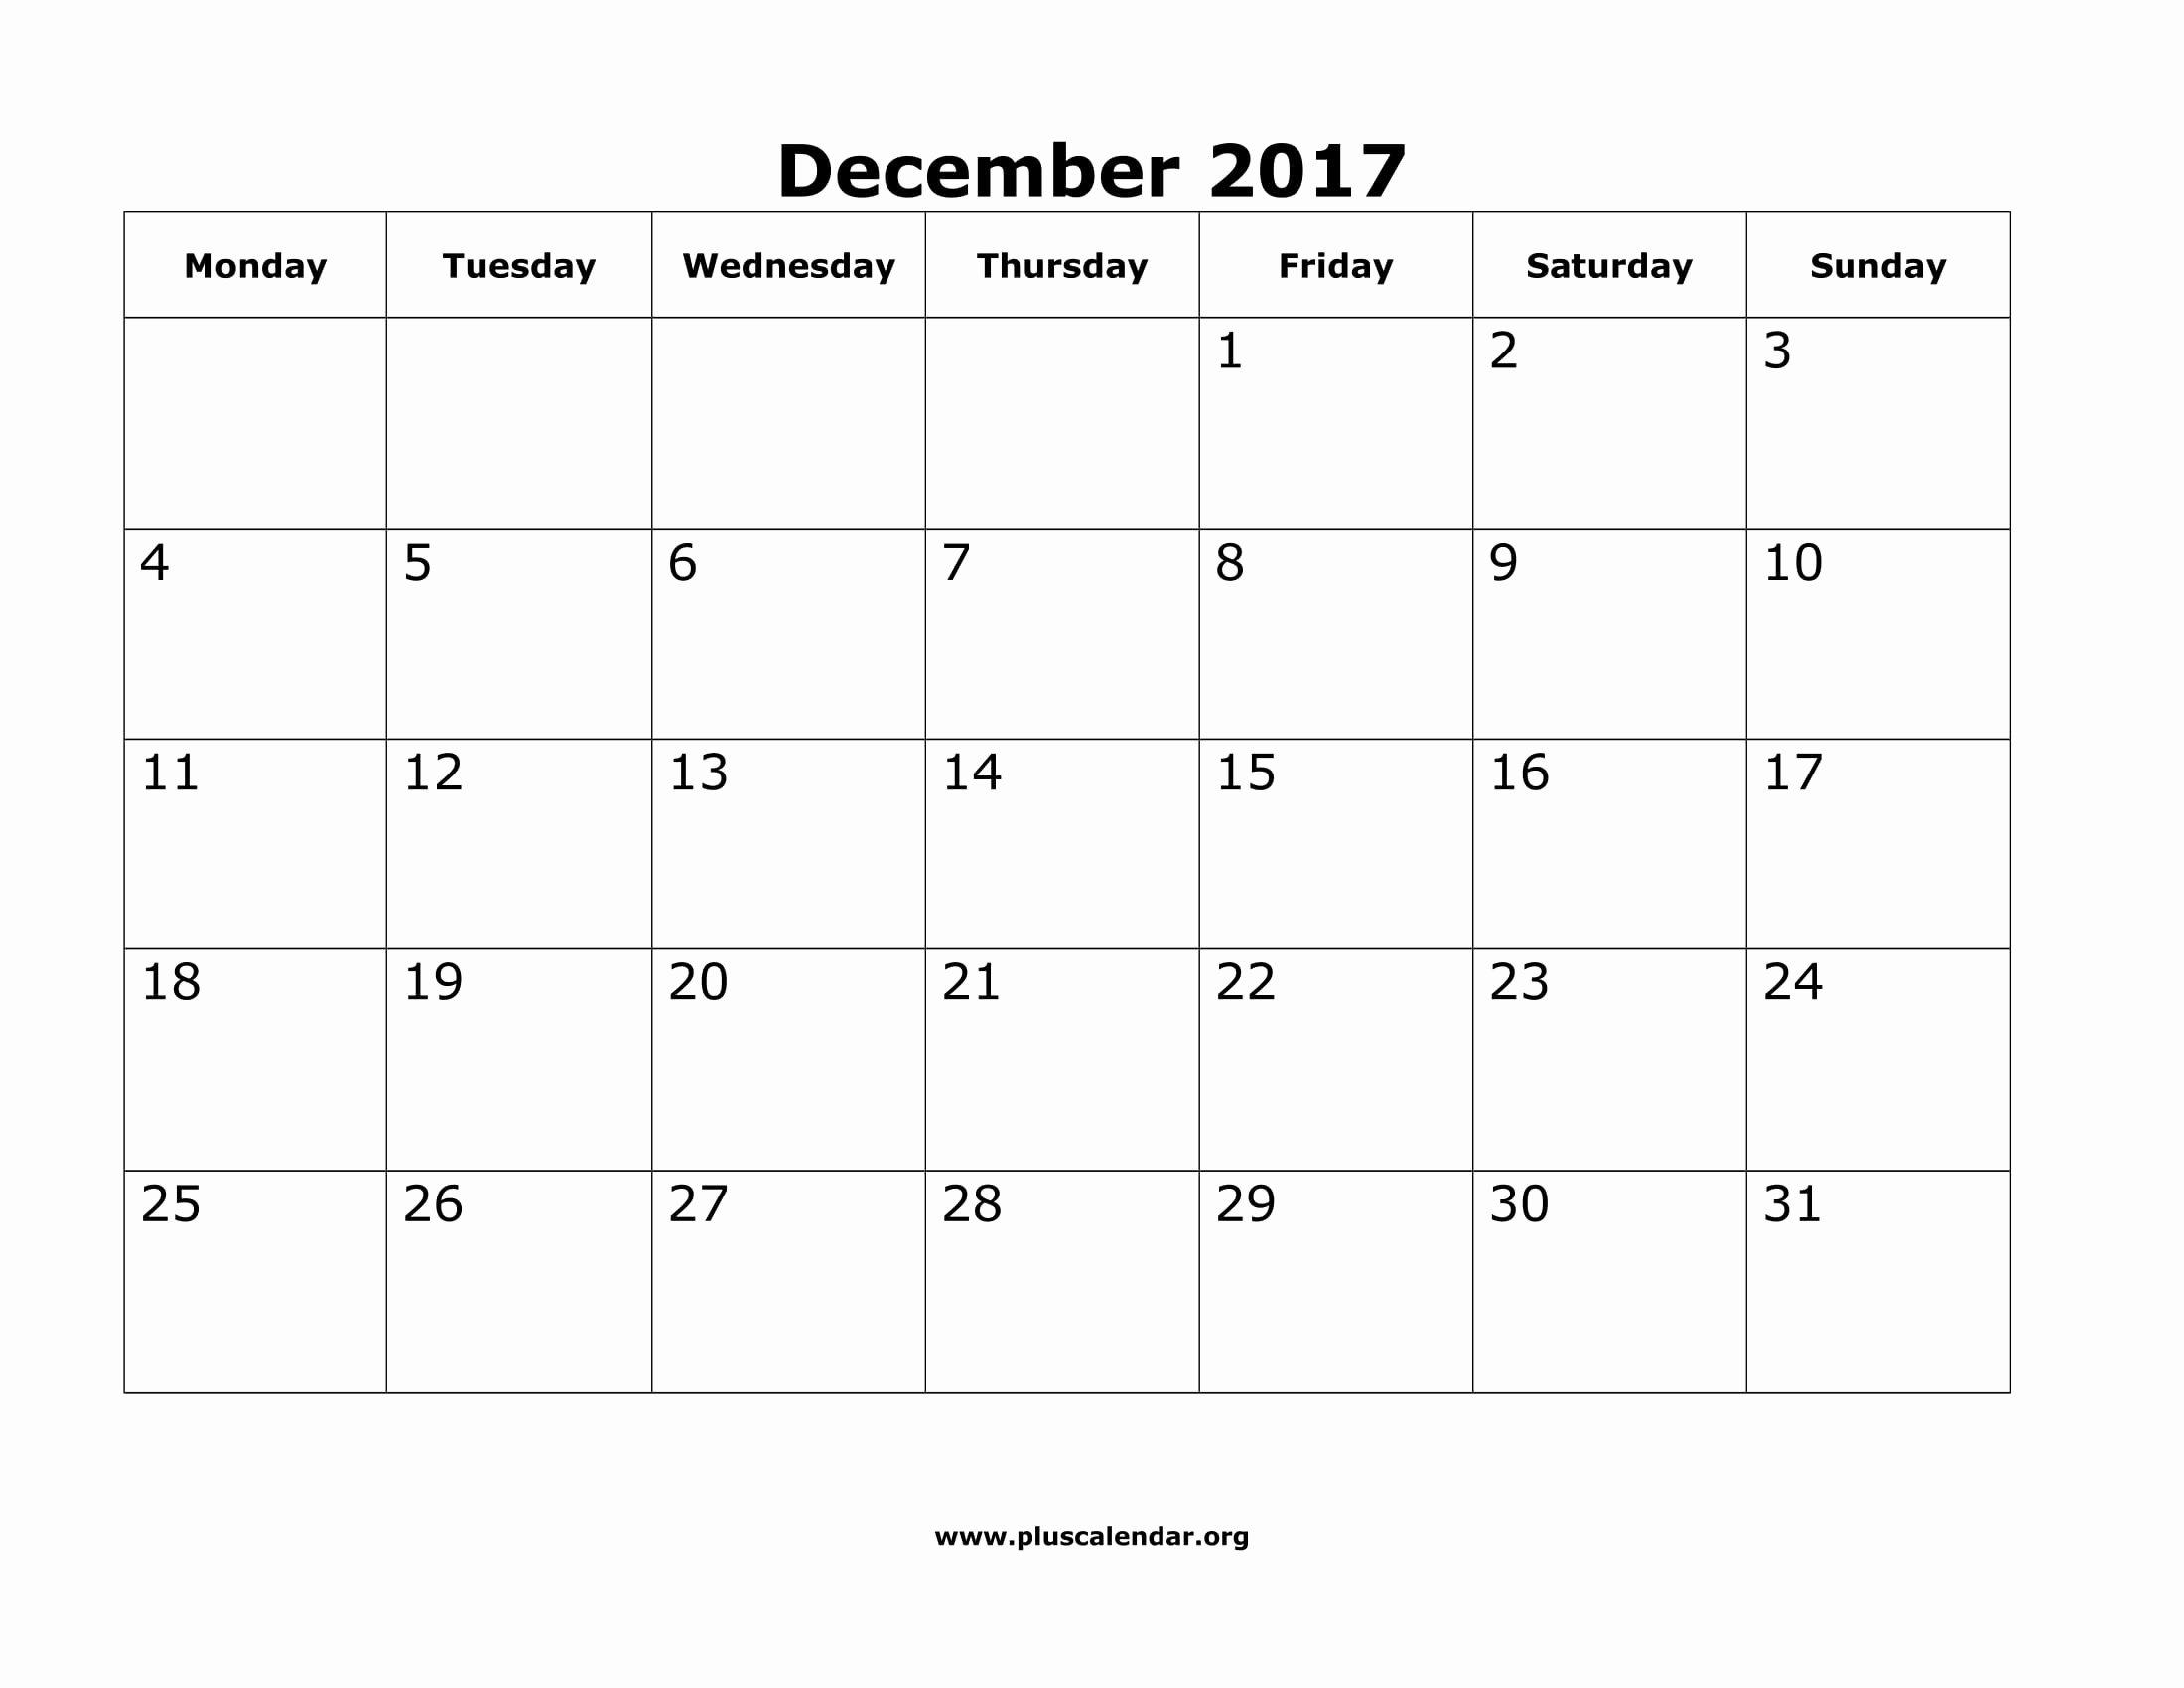 Monday Through Sunday Schedule Template Elegant September 2018 – Page 8 – Template Calendar Design